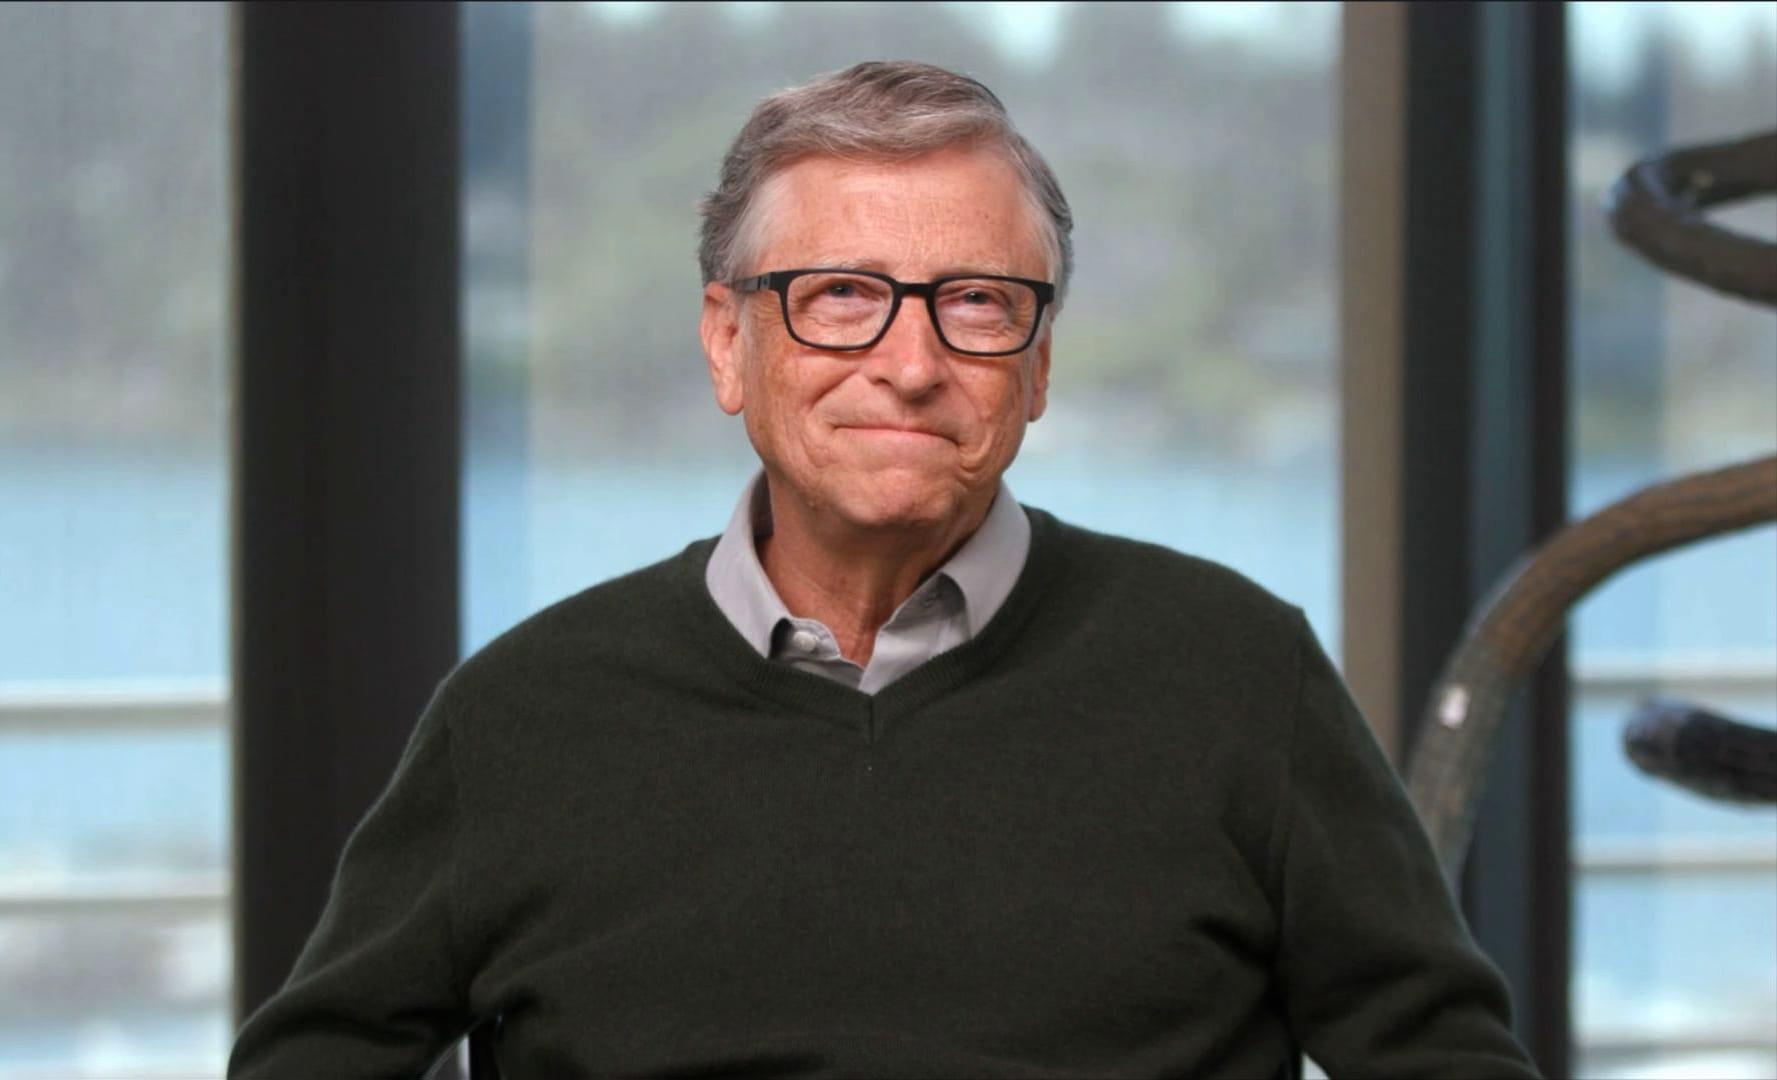 Bill Gates: 'I was naive at Microsoft' didn't realize success would bring antitrust scrutiny – CNBC